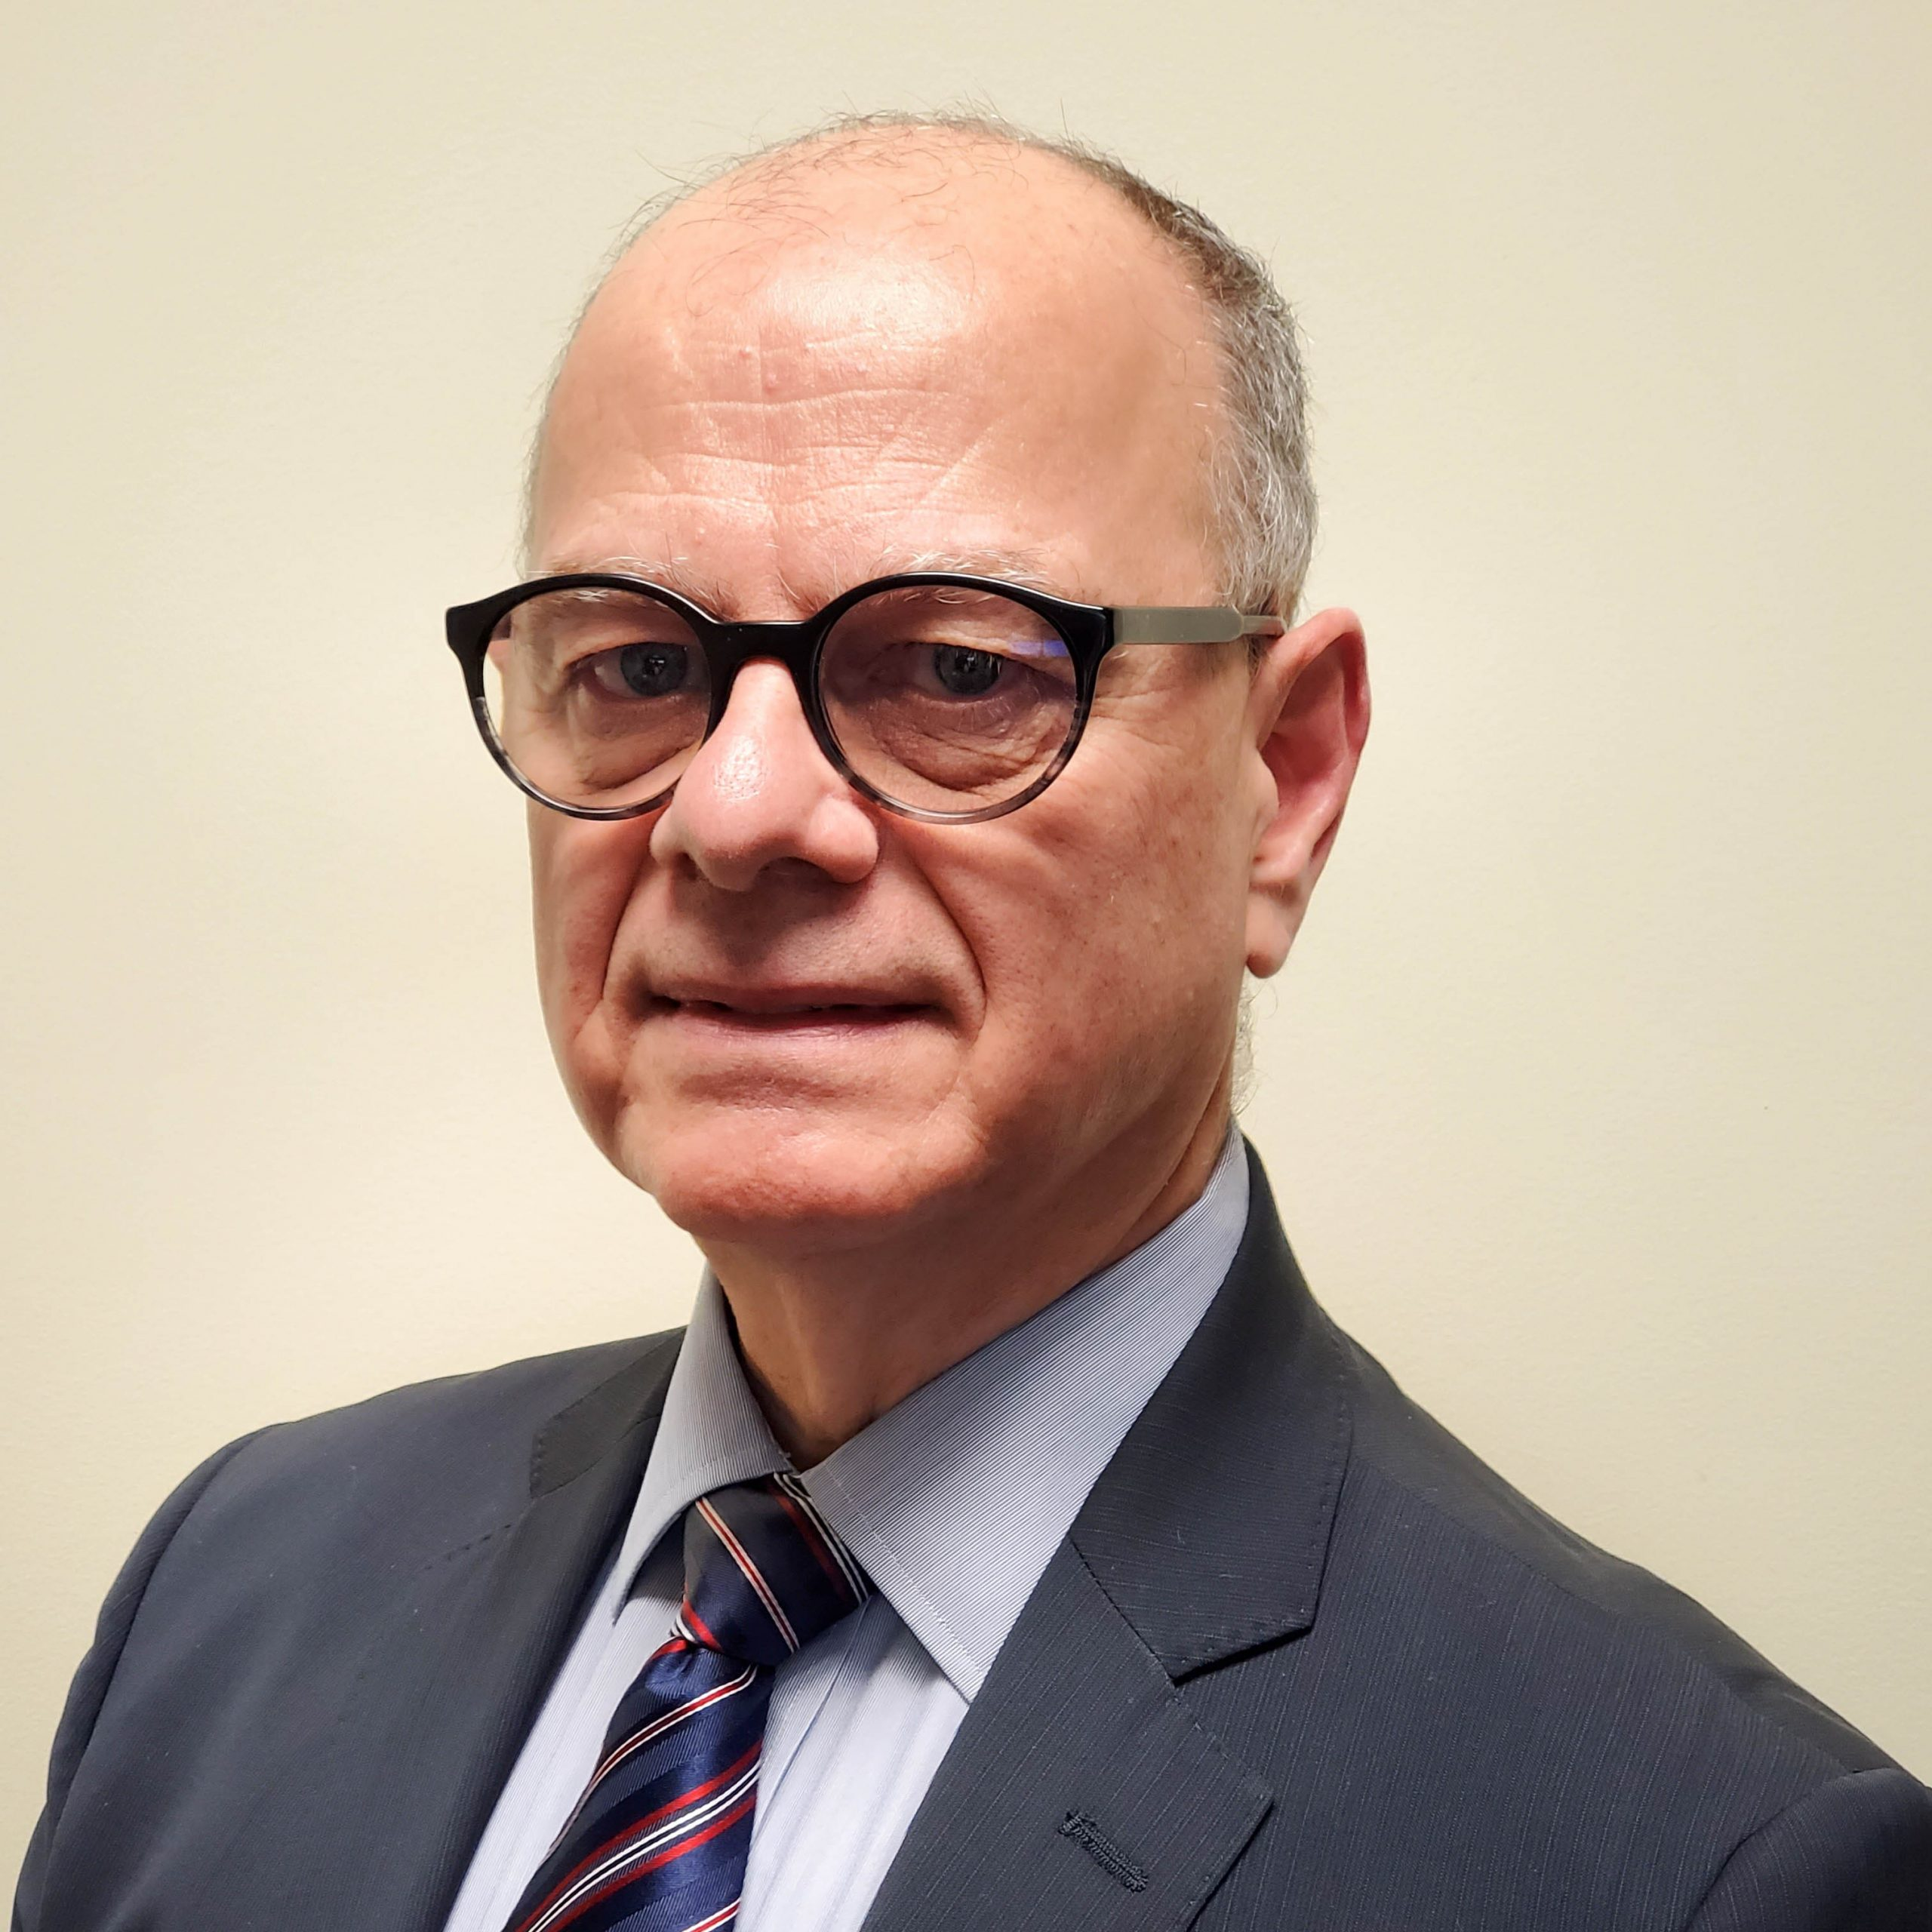 Carlo Sistilli